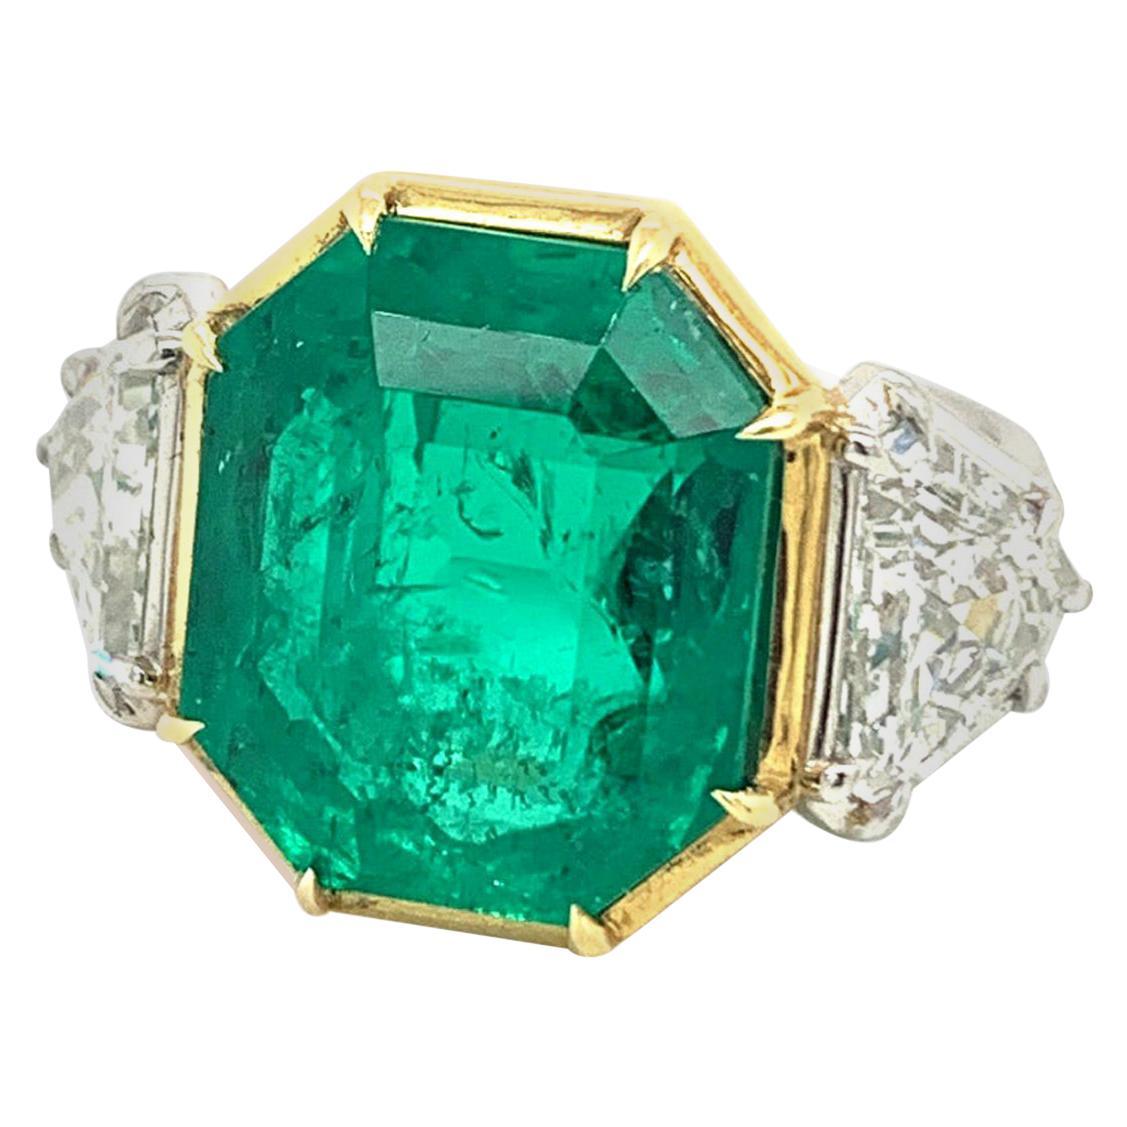 10 Carat AGL Certified Colombian Emerald Diamond Platinum Ring